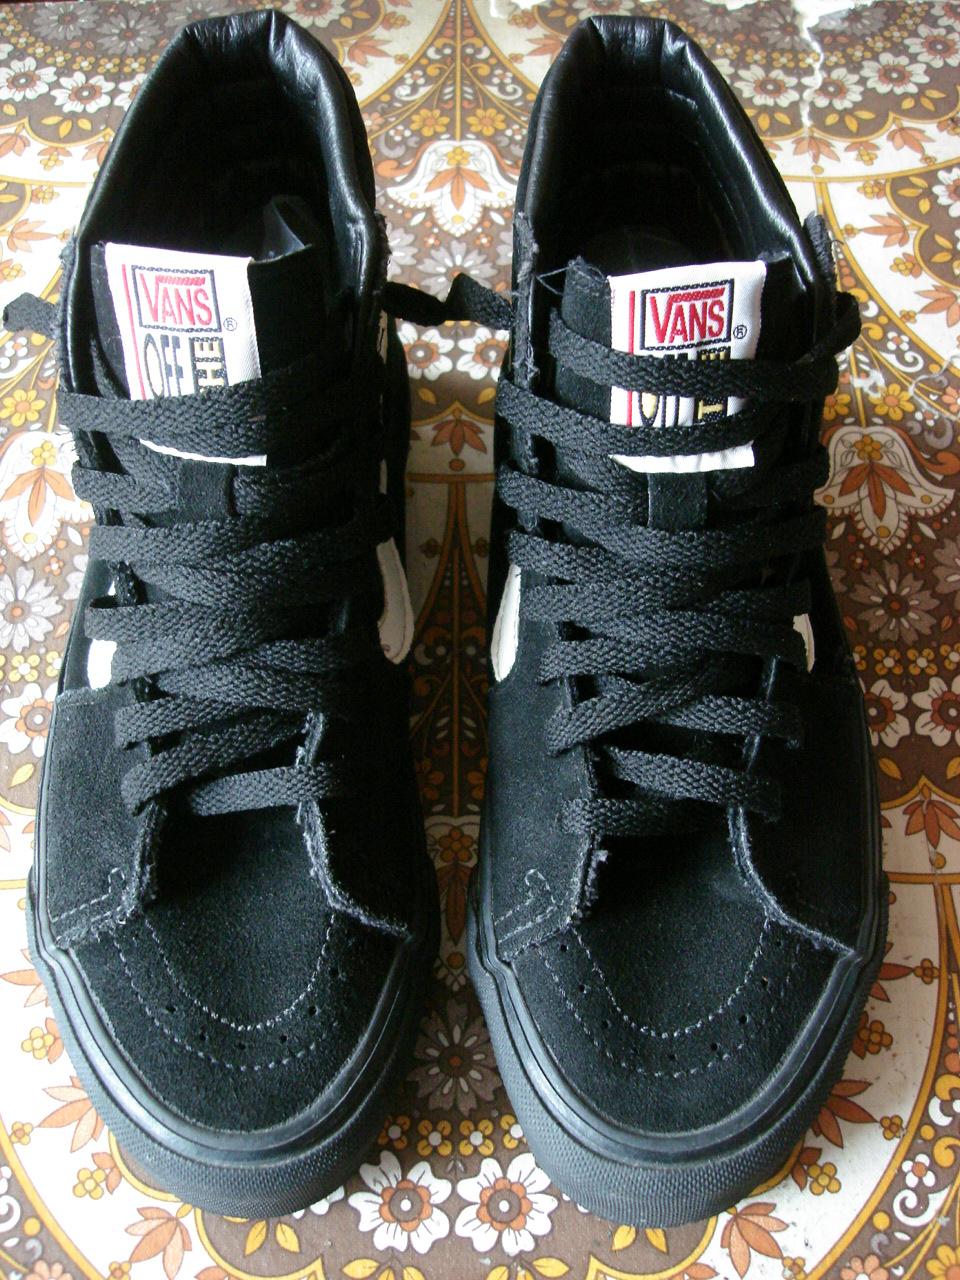 Vintage VANS Custom Black Suede Velvet SK8 HI Style 38 MADE IN USA 1990s Off The Wall US75